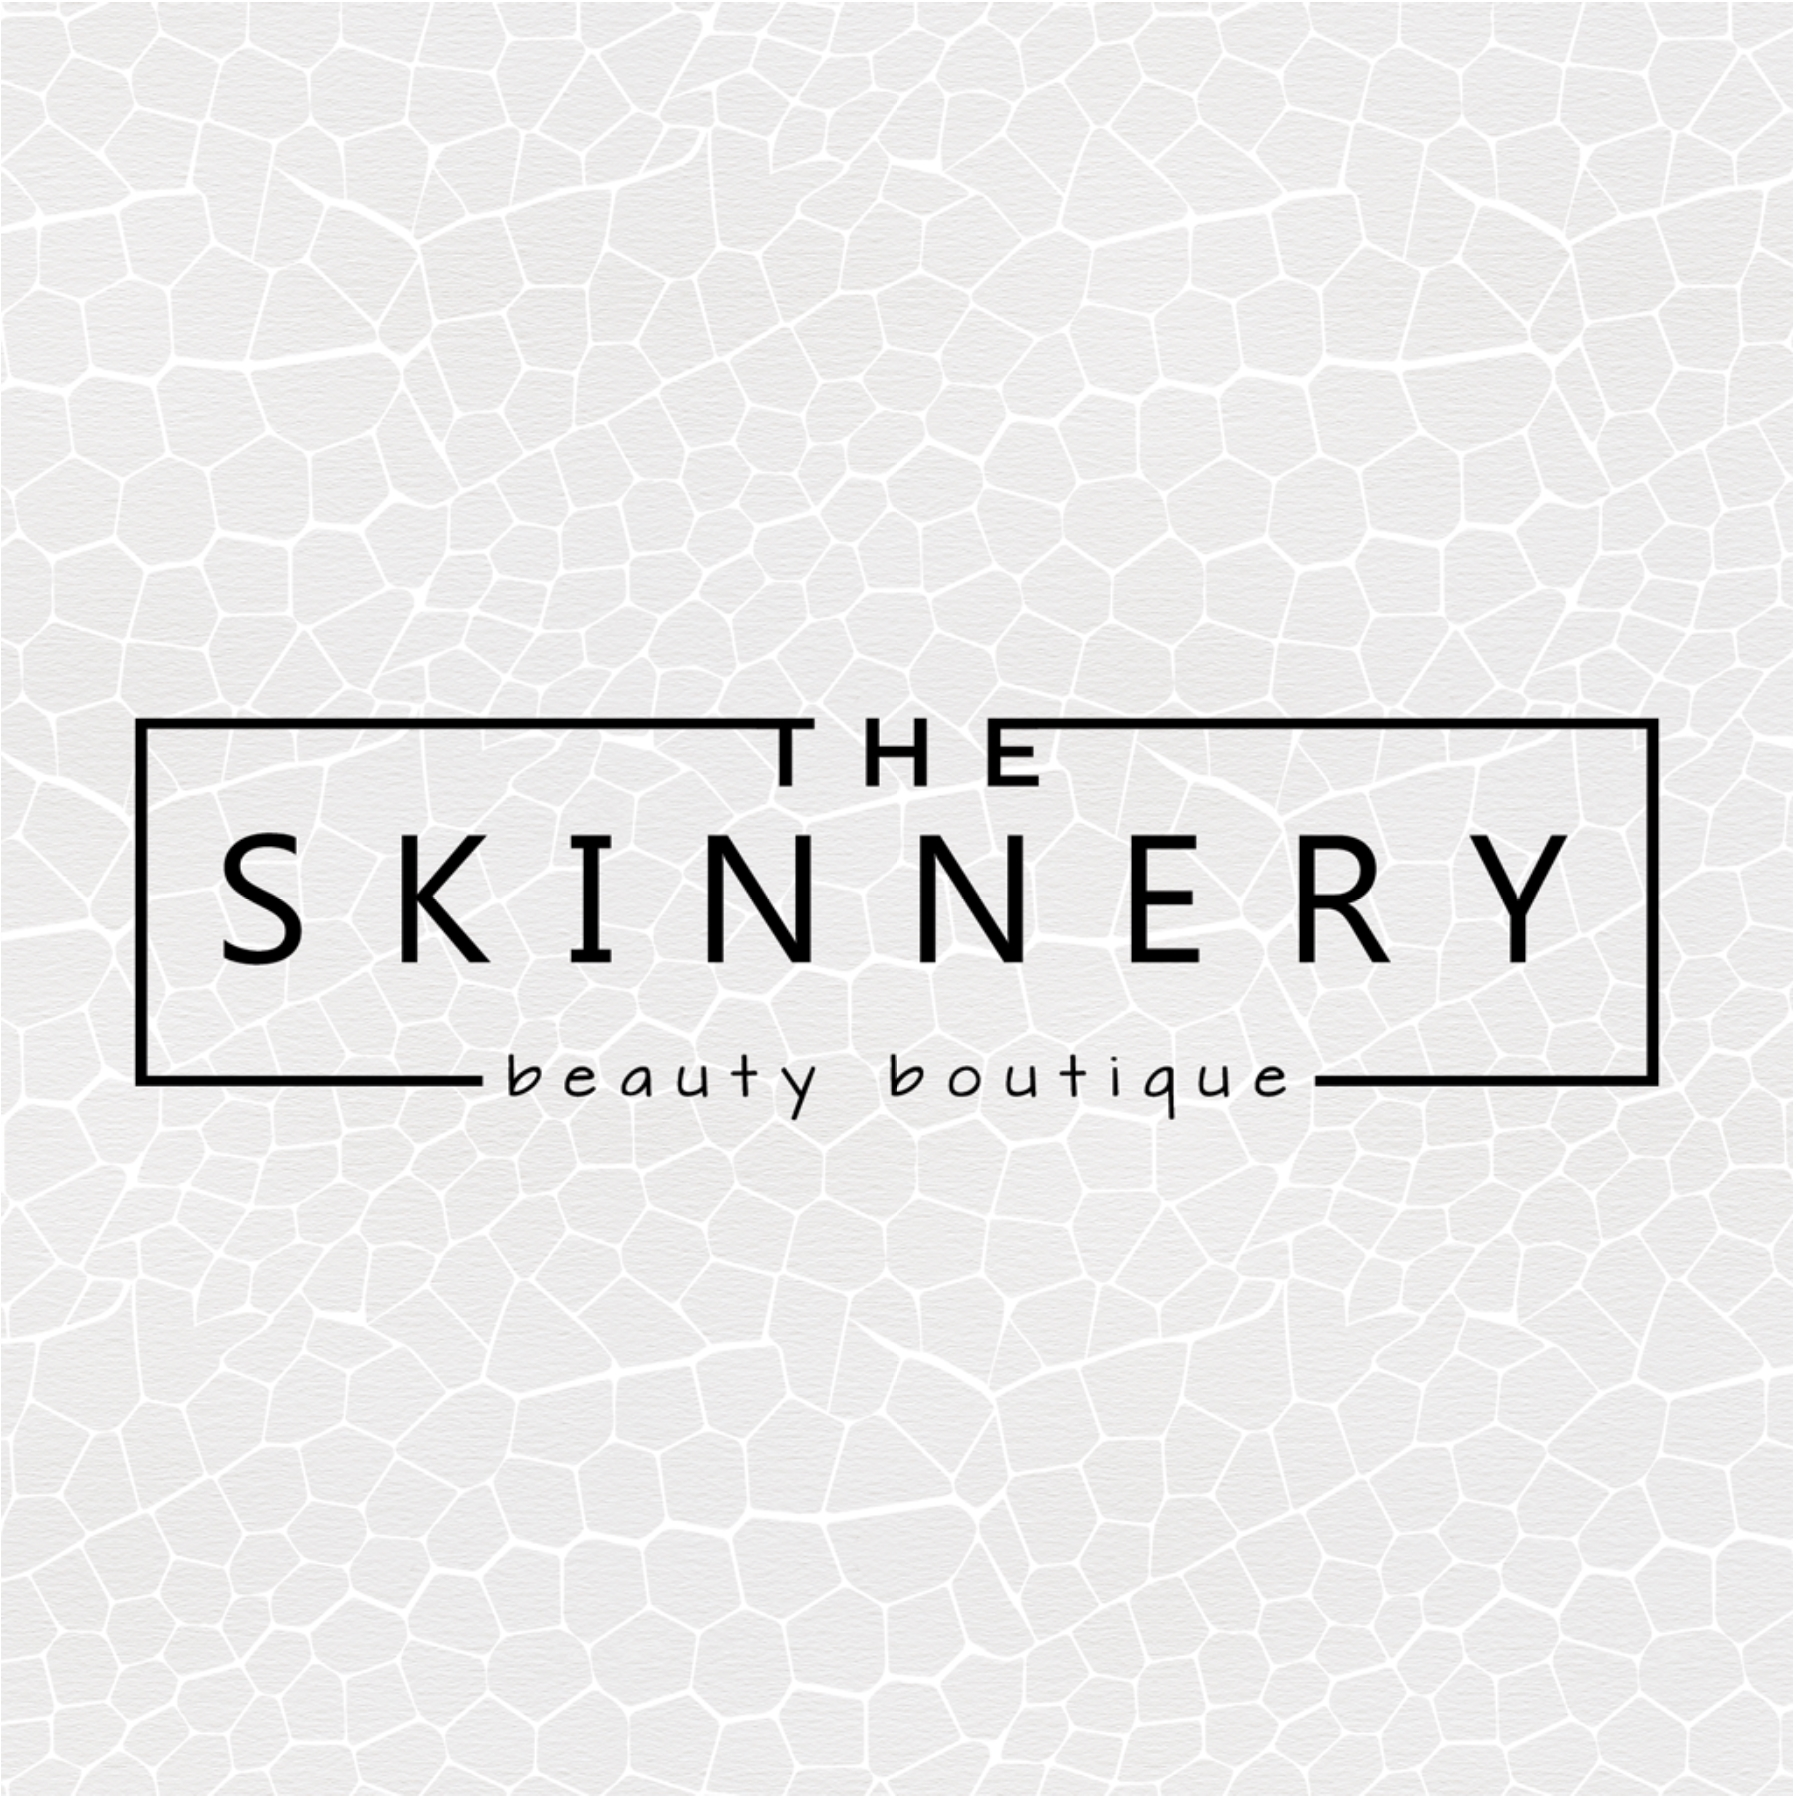 Skinnery